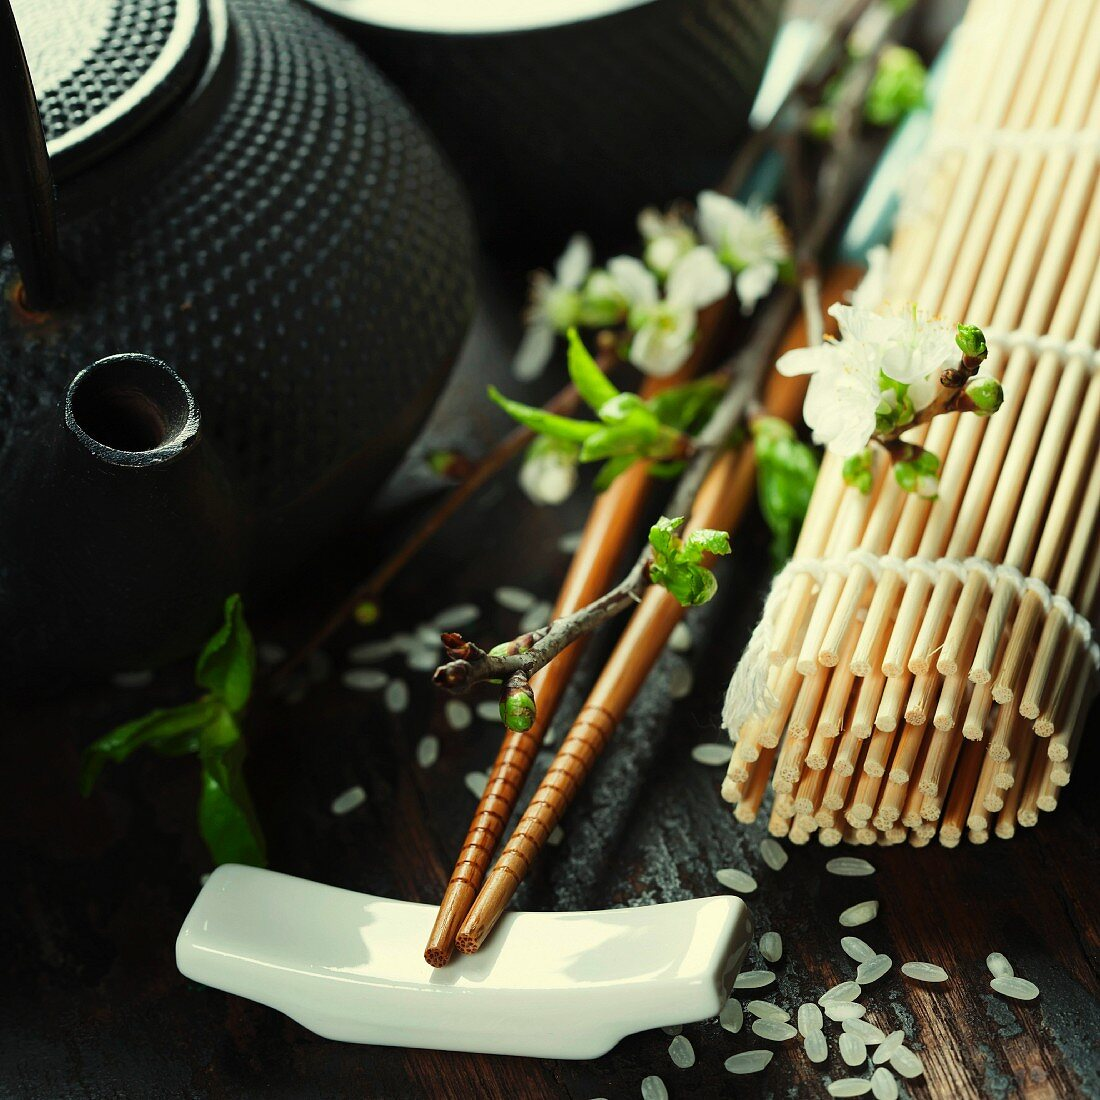 Chinese Tea Set, chopsticks and sakura branch on rustic wooden table